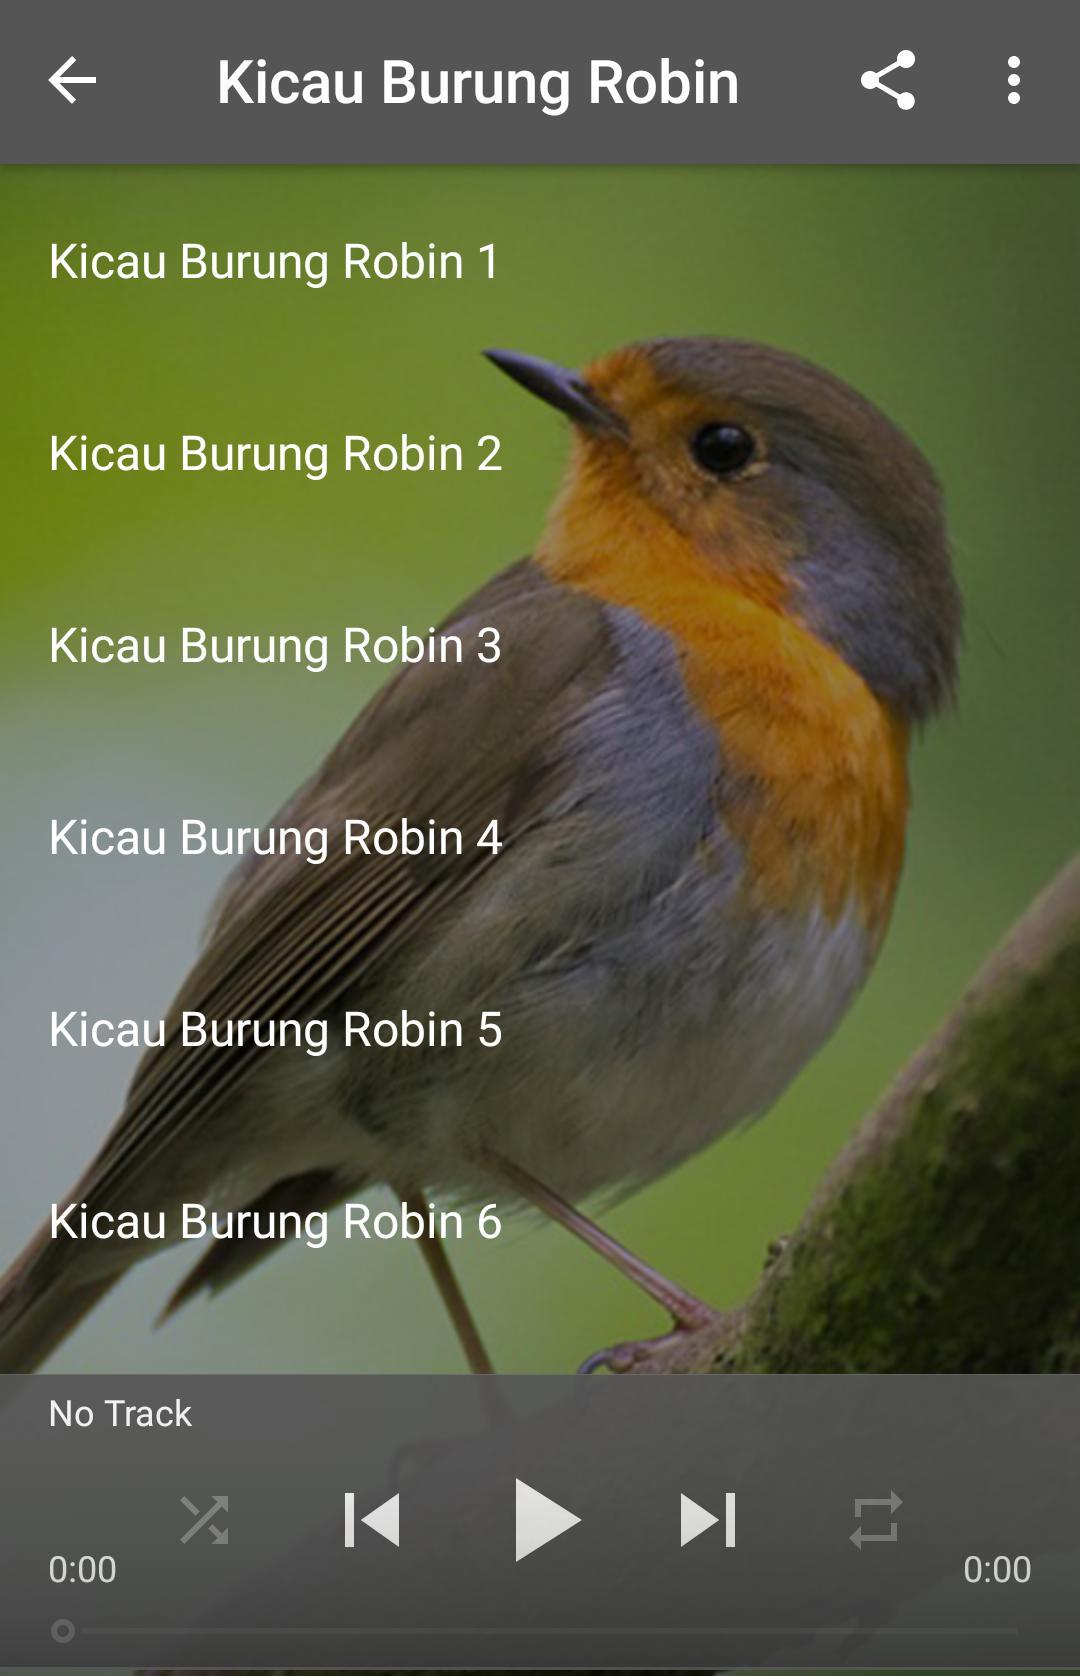 Kicau Burung Robin For Android Apk Download